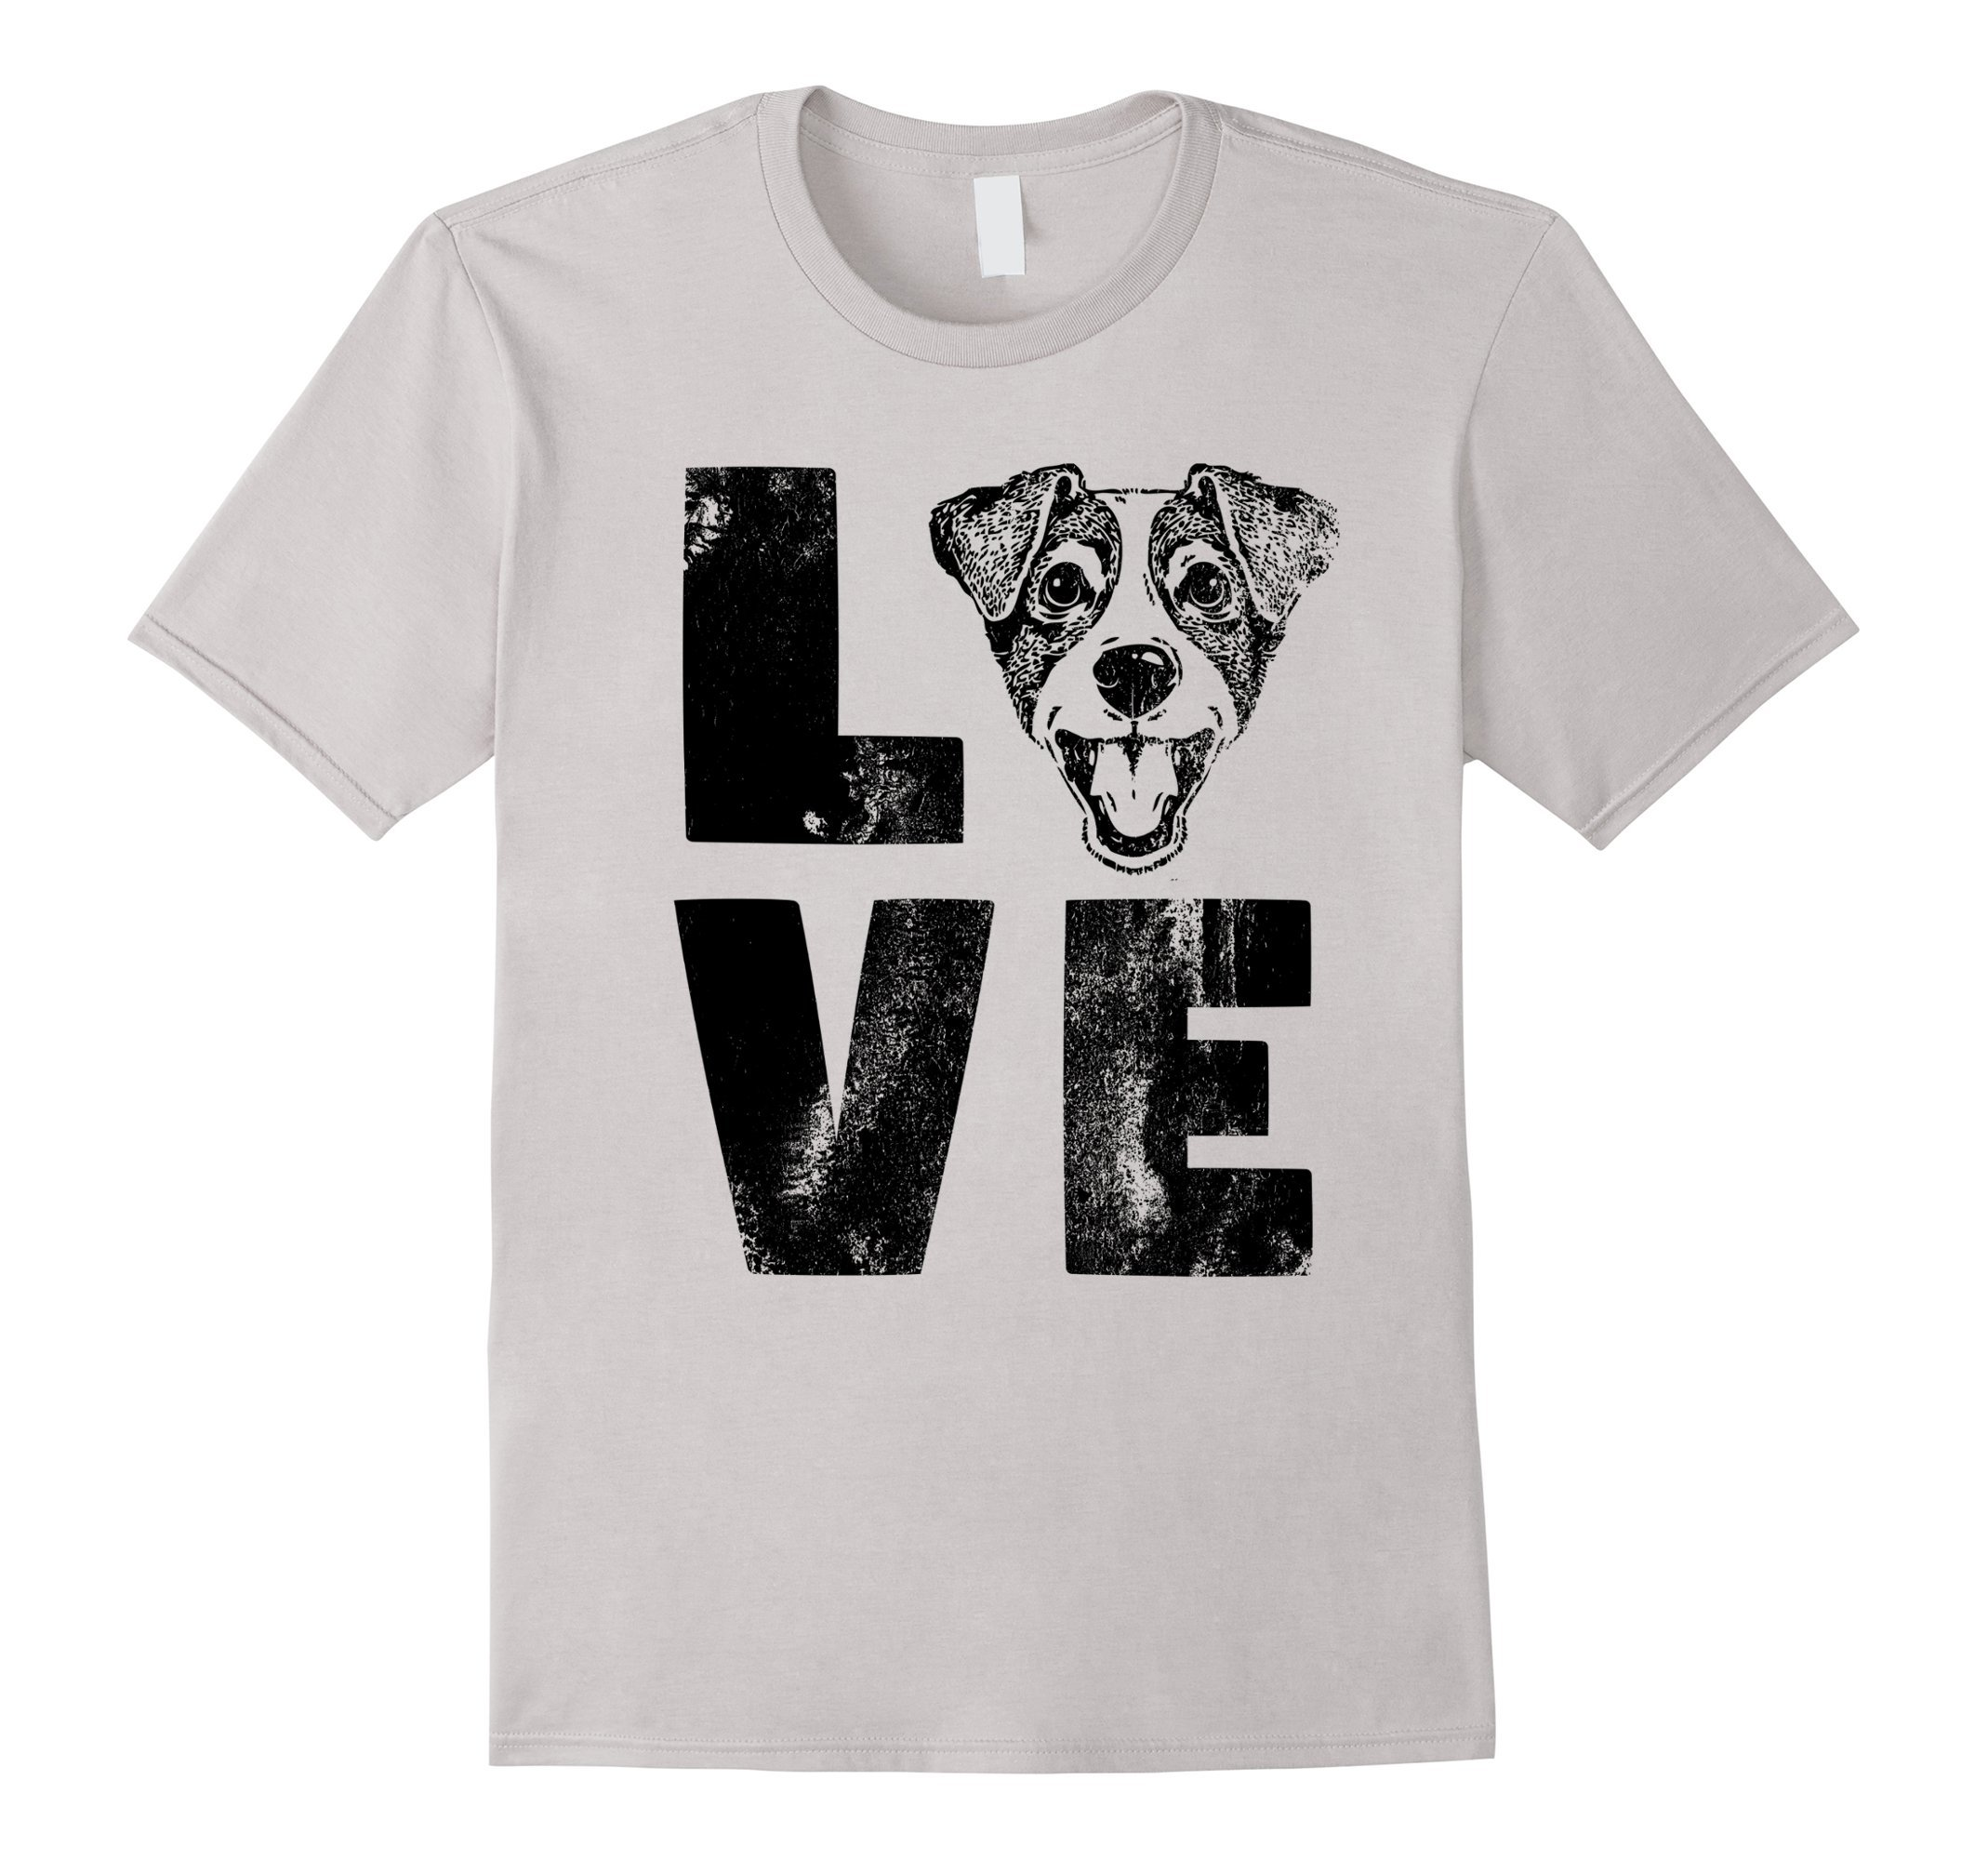 Mens Dog Shirt Love Jack Russell Terrier Shirt Dog Lovers Shirt Large Silver